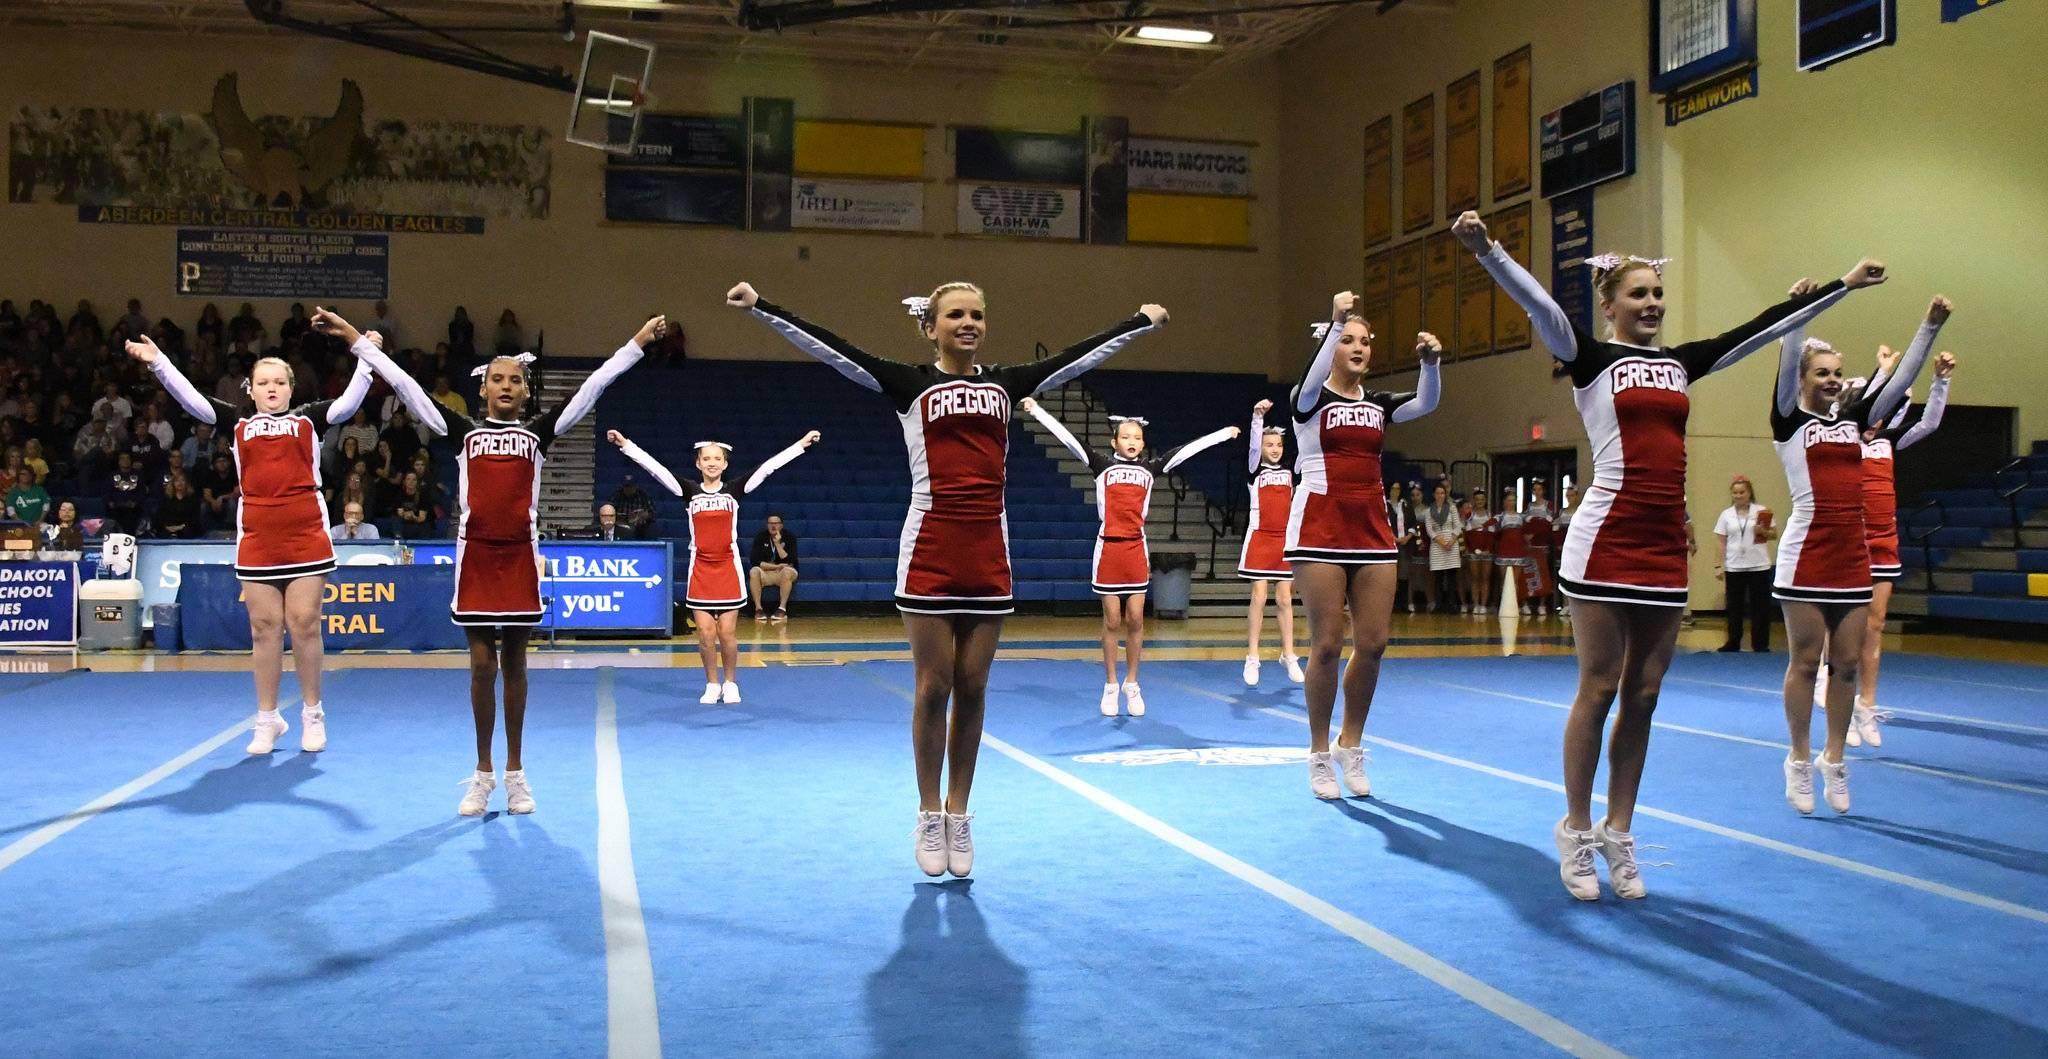 Gregory cheer team